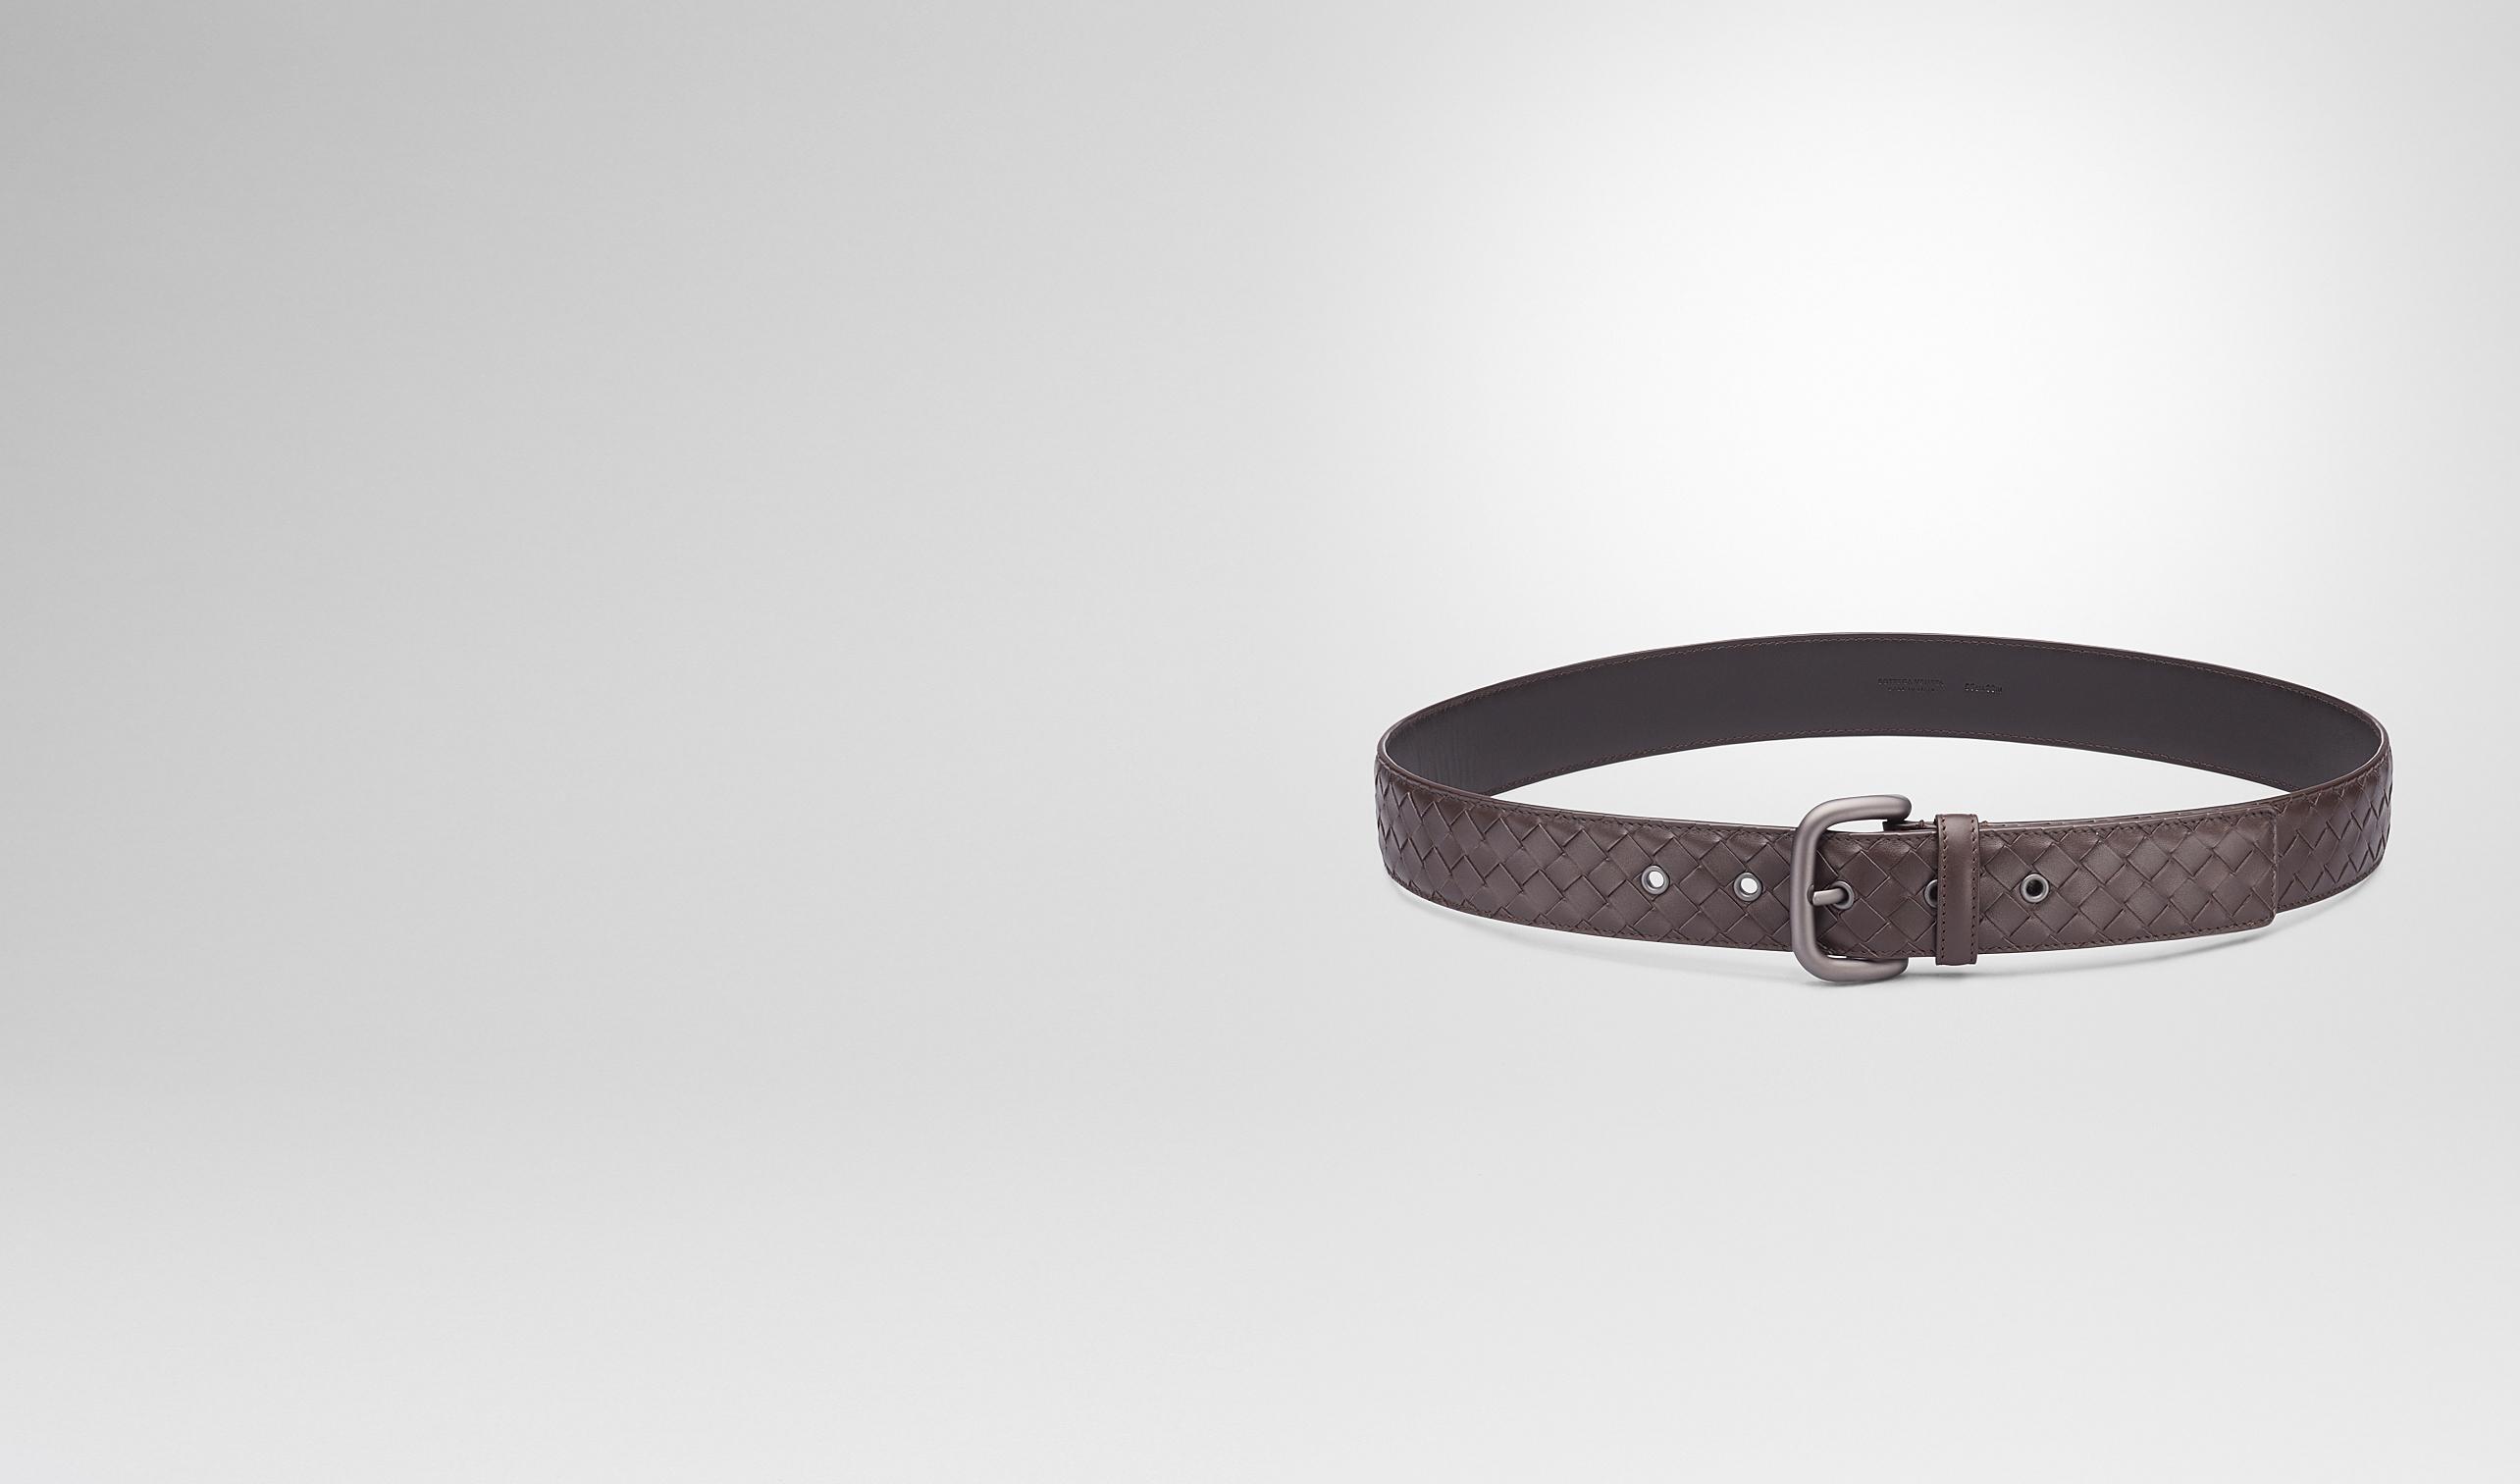 BOTTEGA VENETA Cintura U Cintura Ebano in VN Intrecciato pl